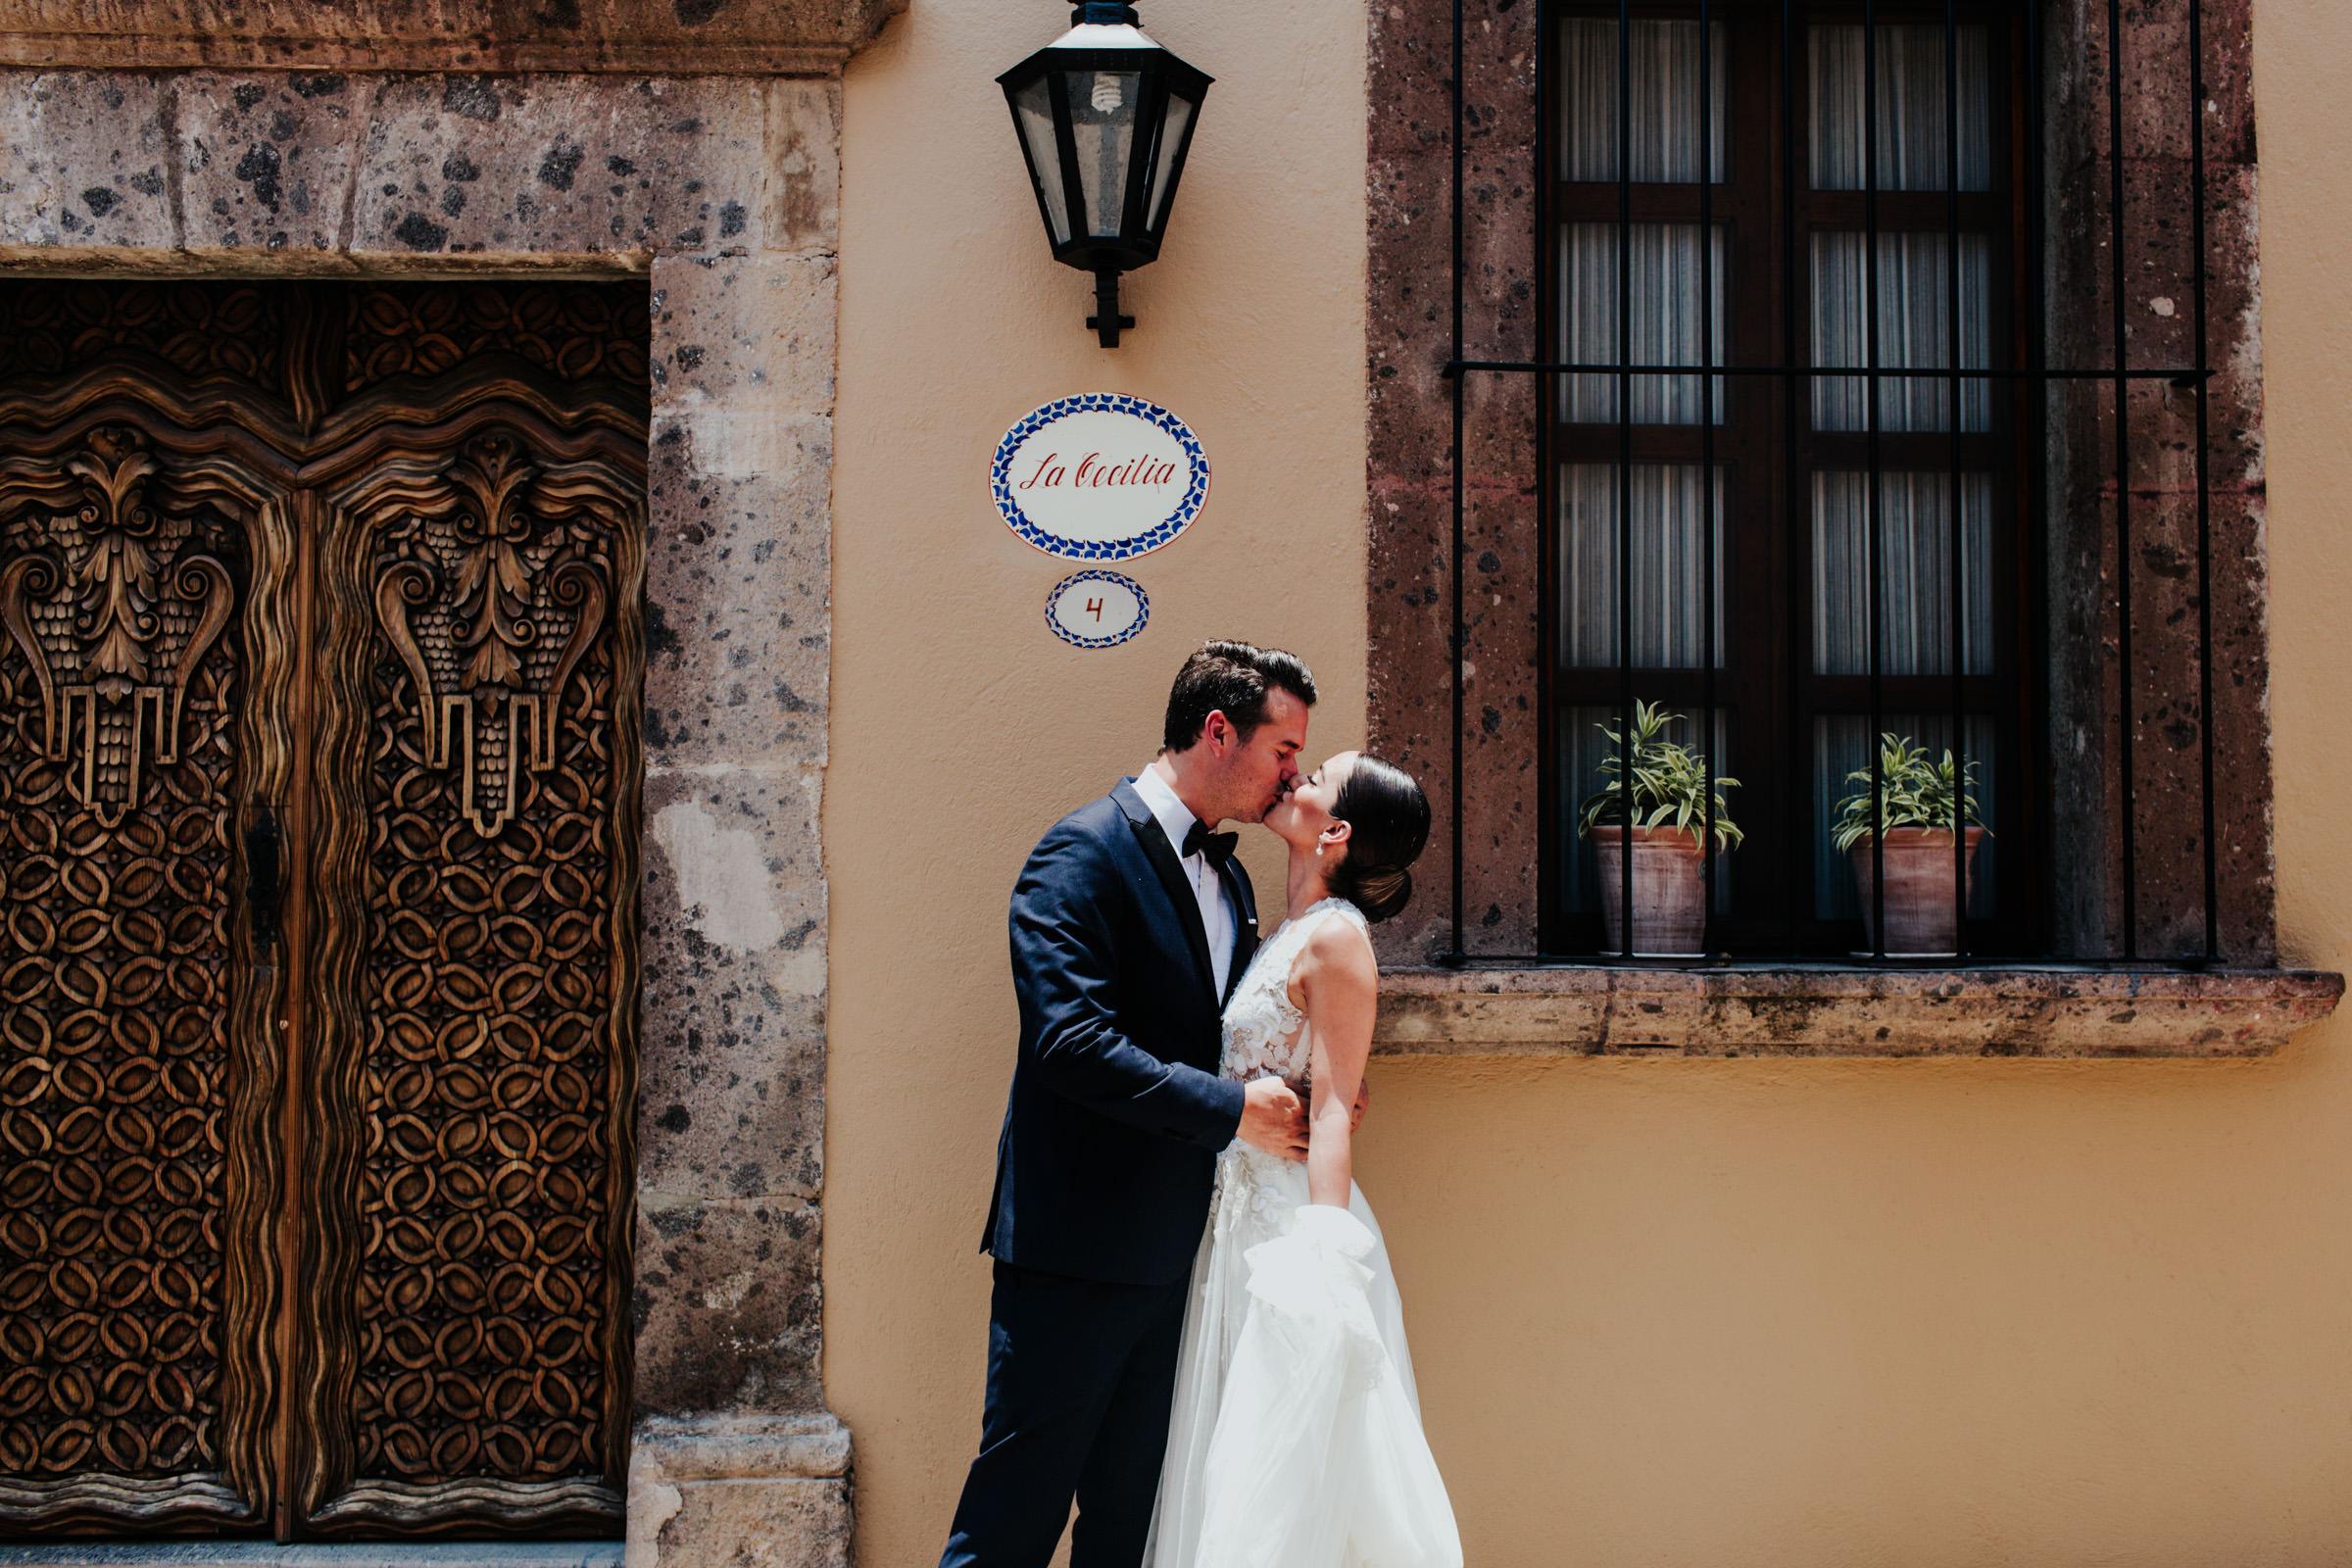 San-Miguel-de-Allende-Wedding-Photography-Parroquia-Instituto-Boda-Fotografia-Fer-Sergio-Pierce-Lifestyle-Photography0215.JPG